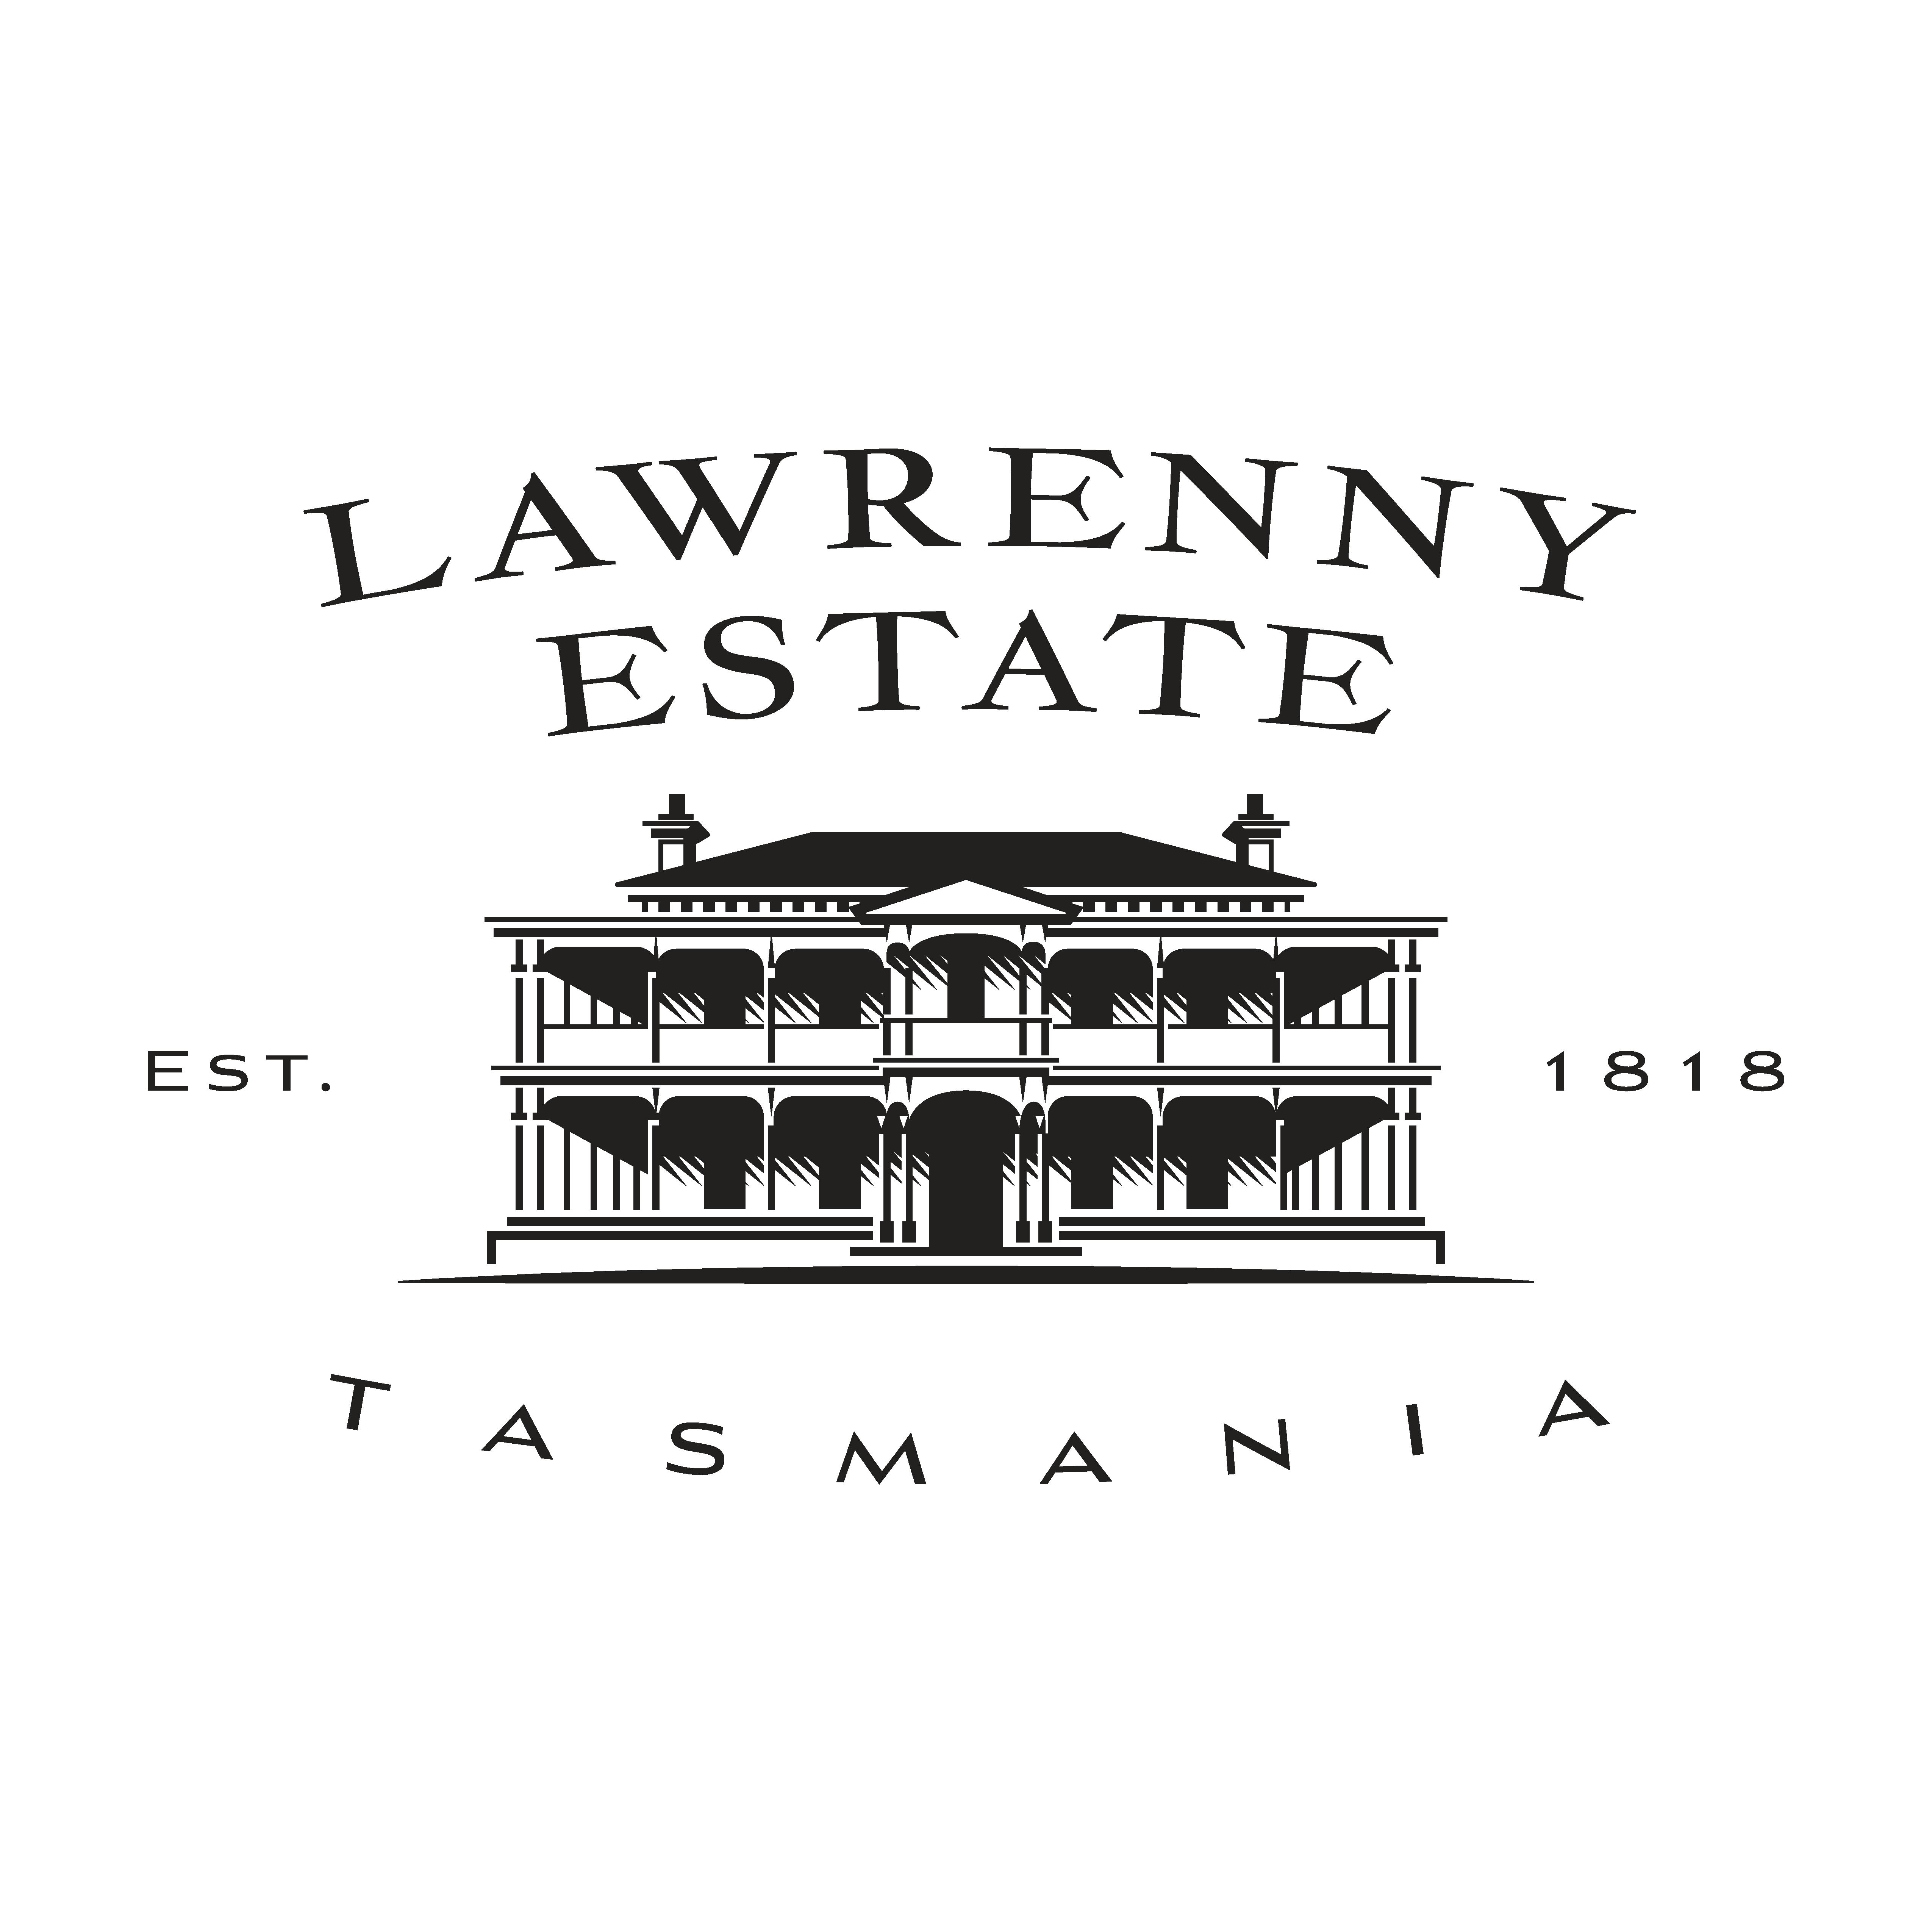 create a logo for Lawrenny Estate Premium produce company  Tasmania